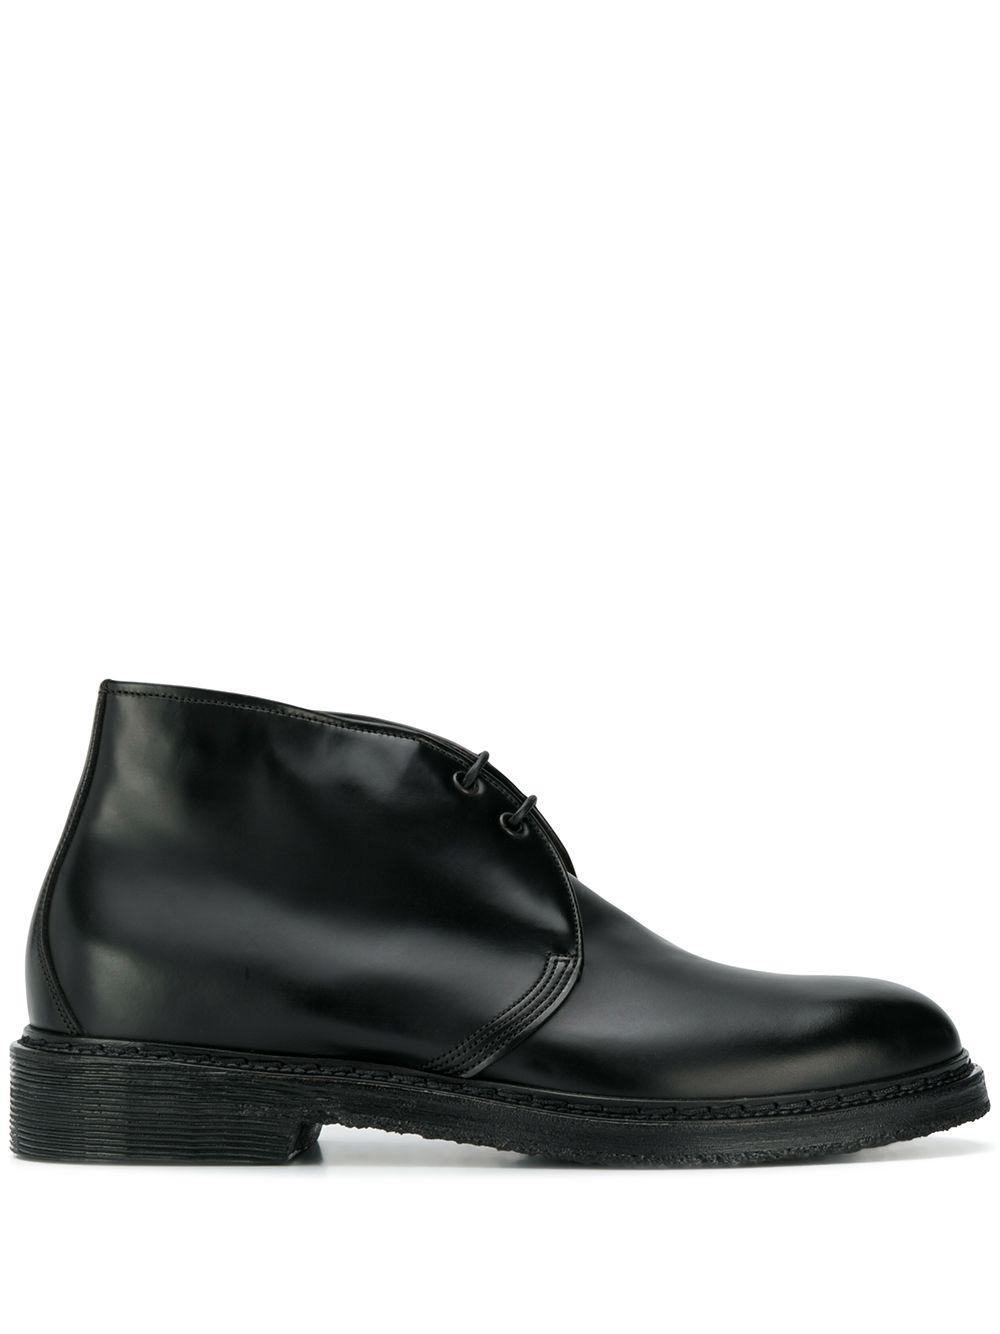 Silvano Sassetti | ботинки на шнуровке | Clouty